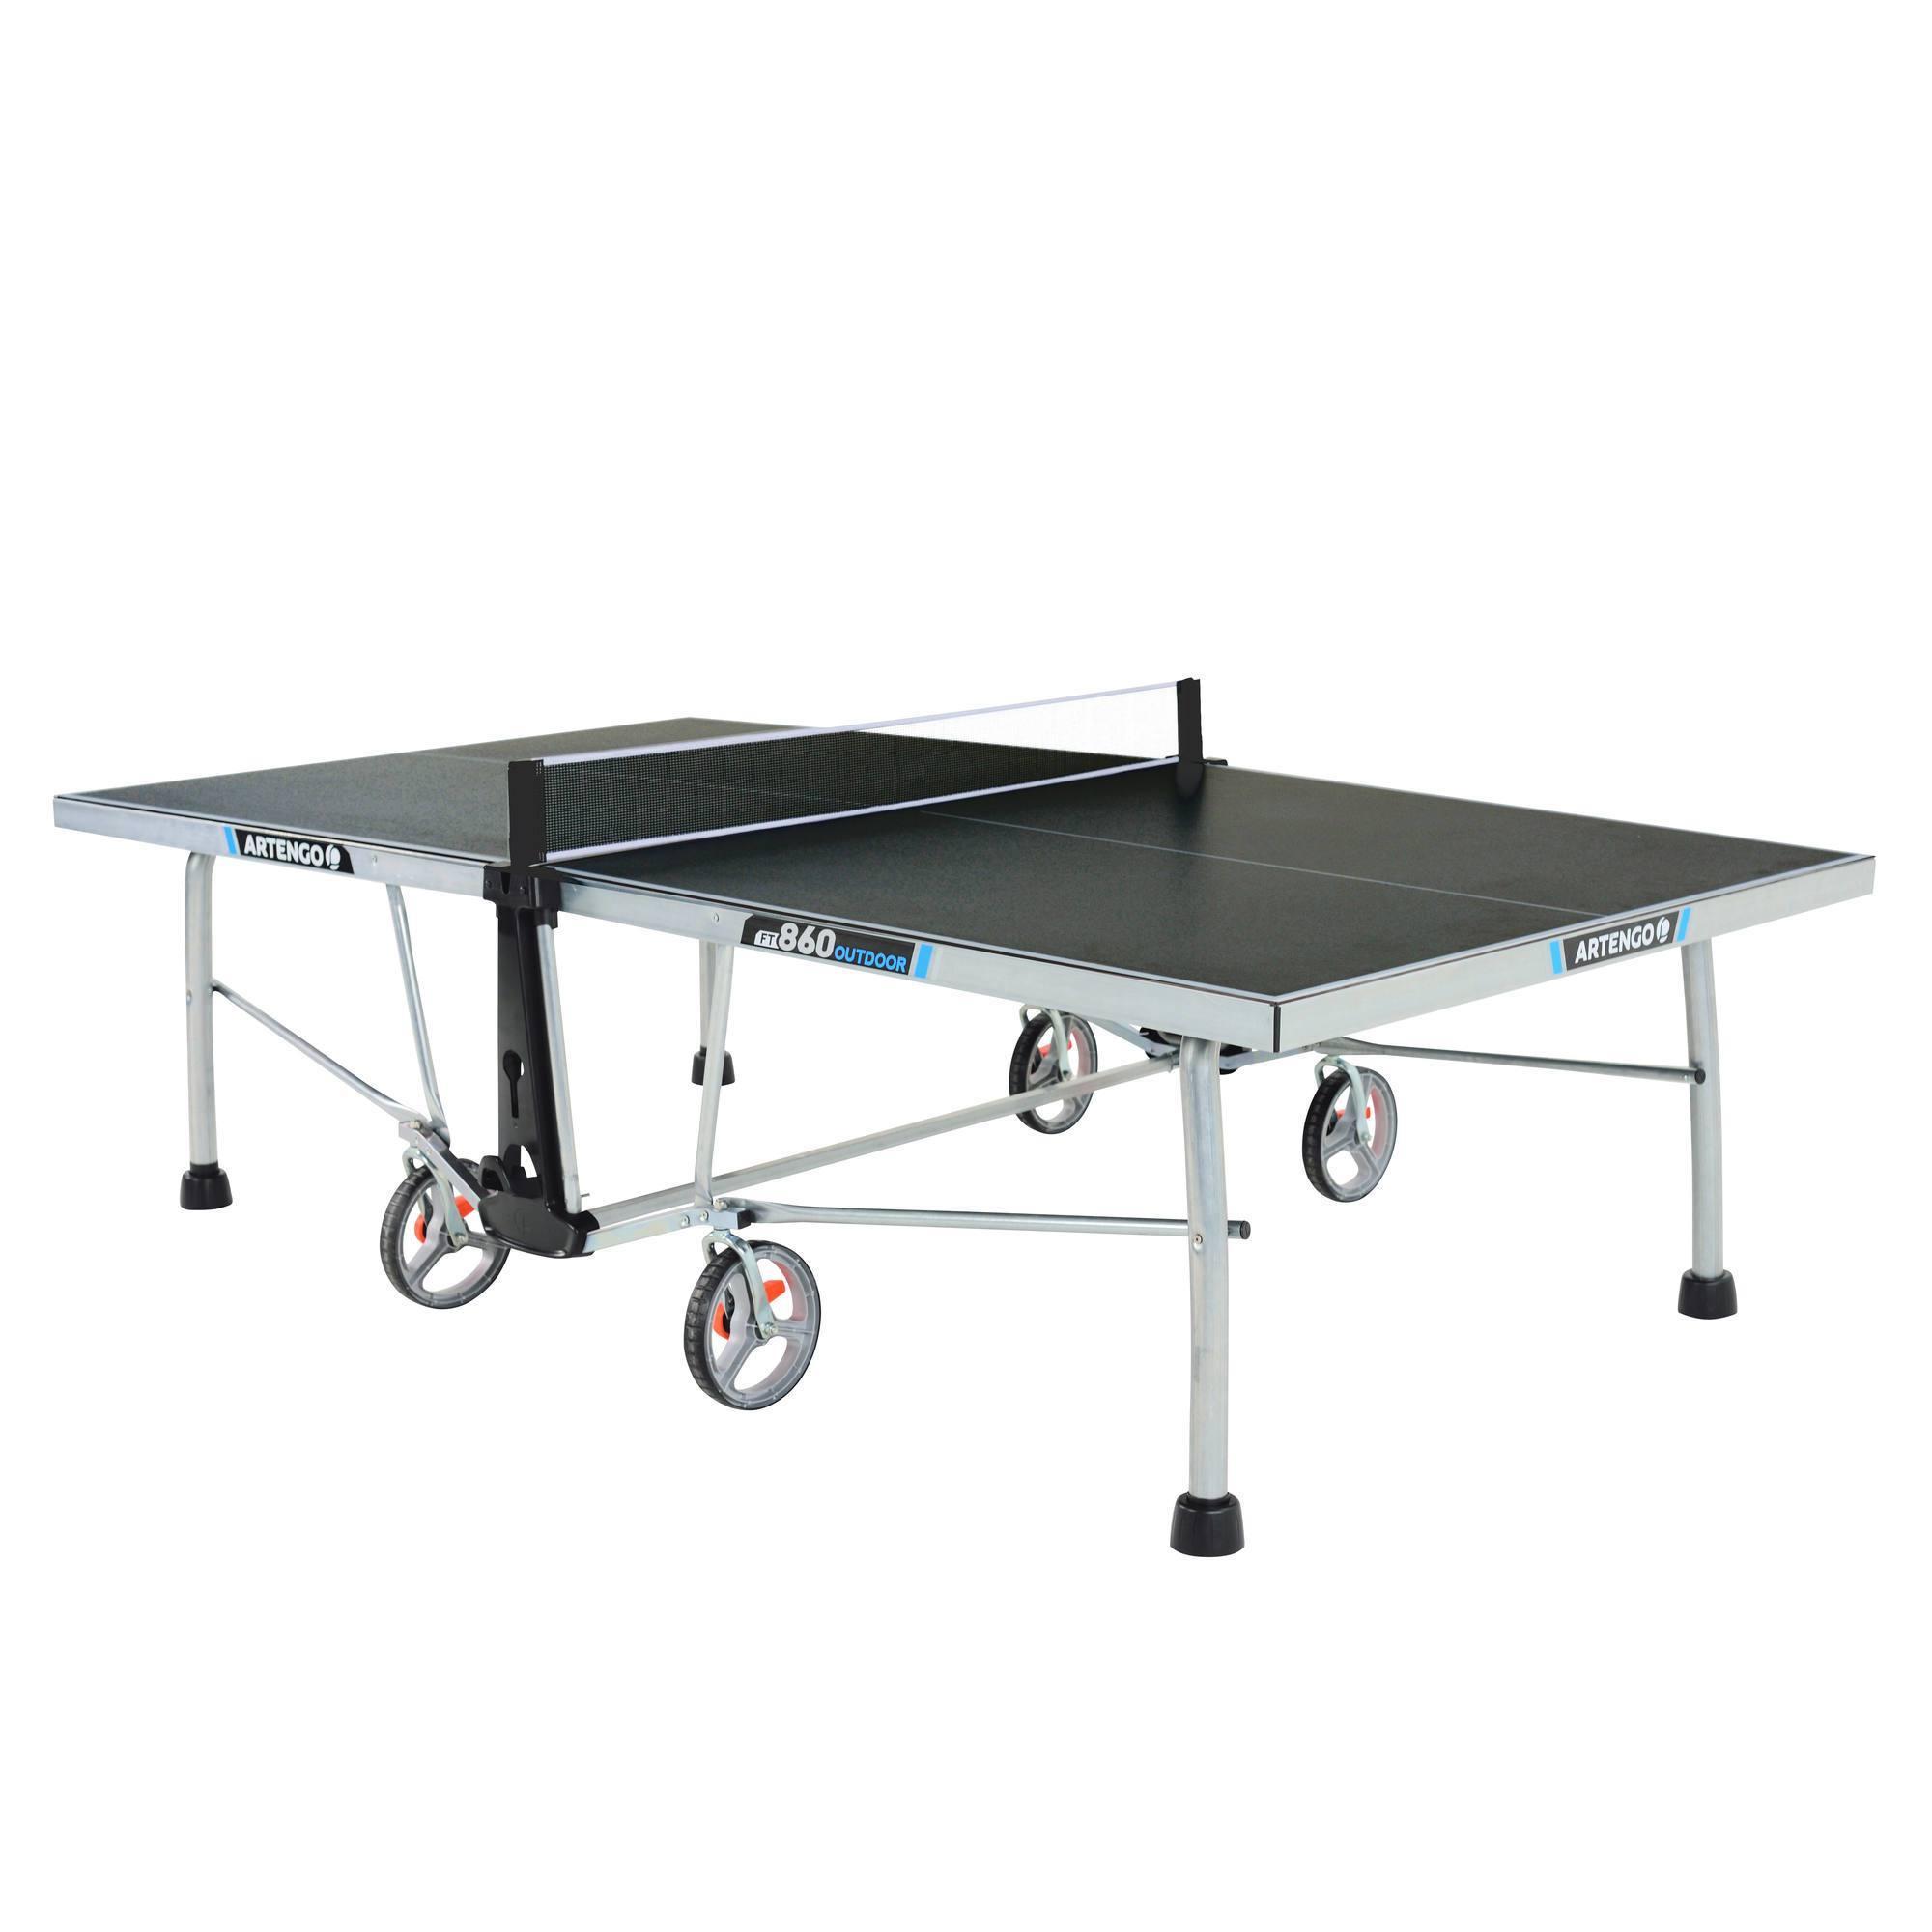 artengo table tennis